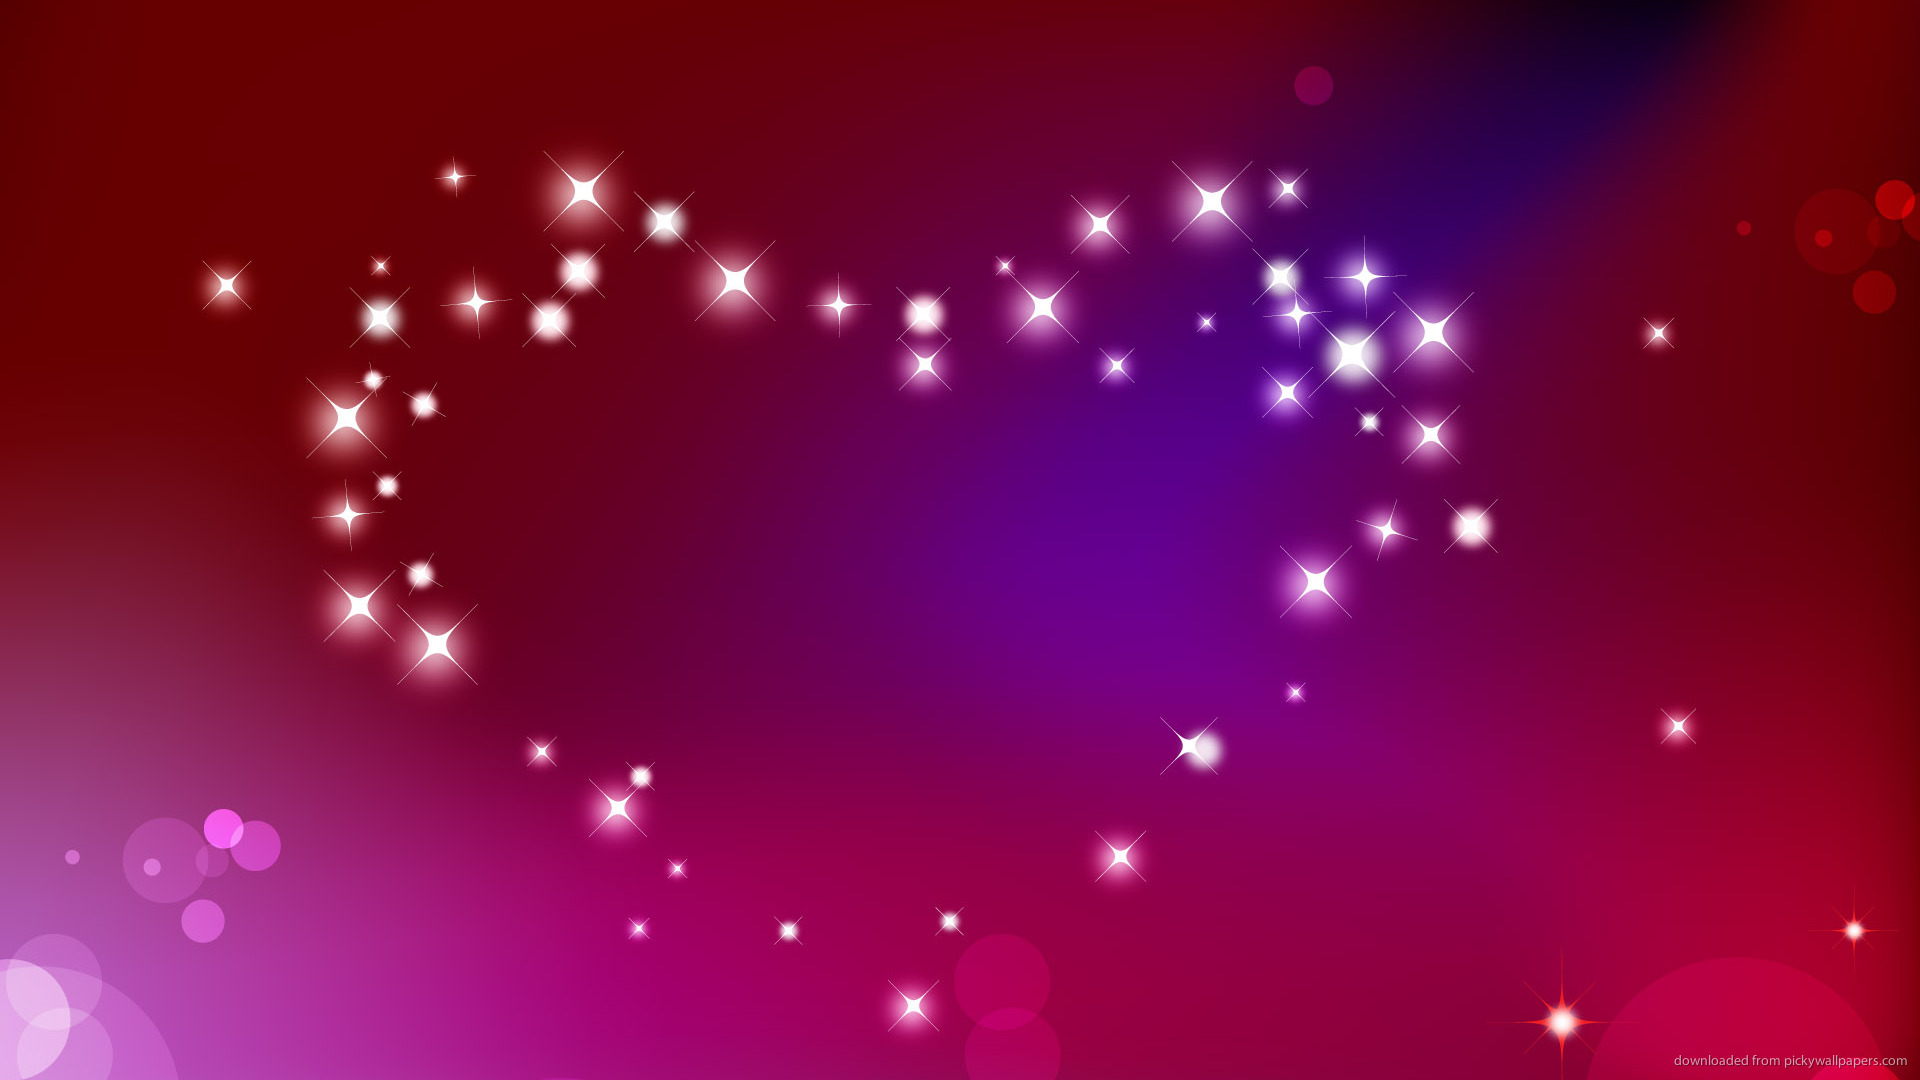 46 stars and hearts wallpaper on wallpapersafari